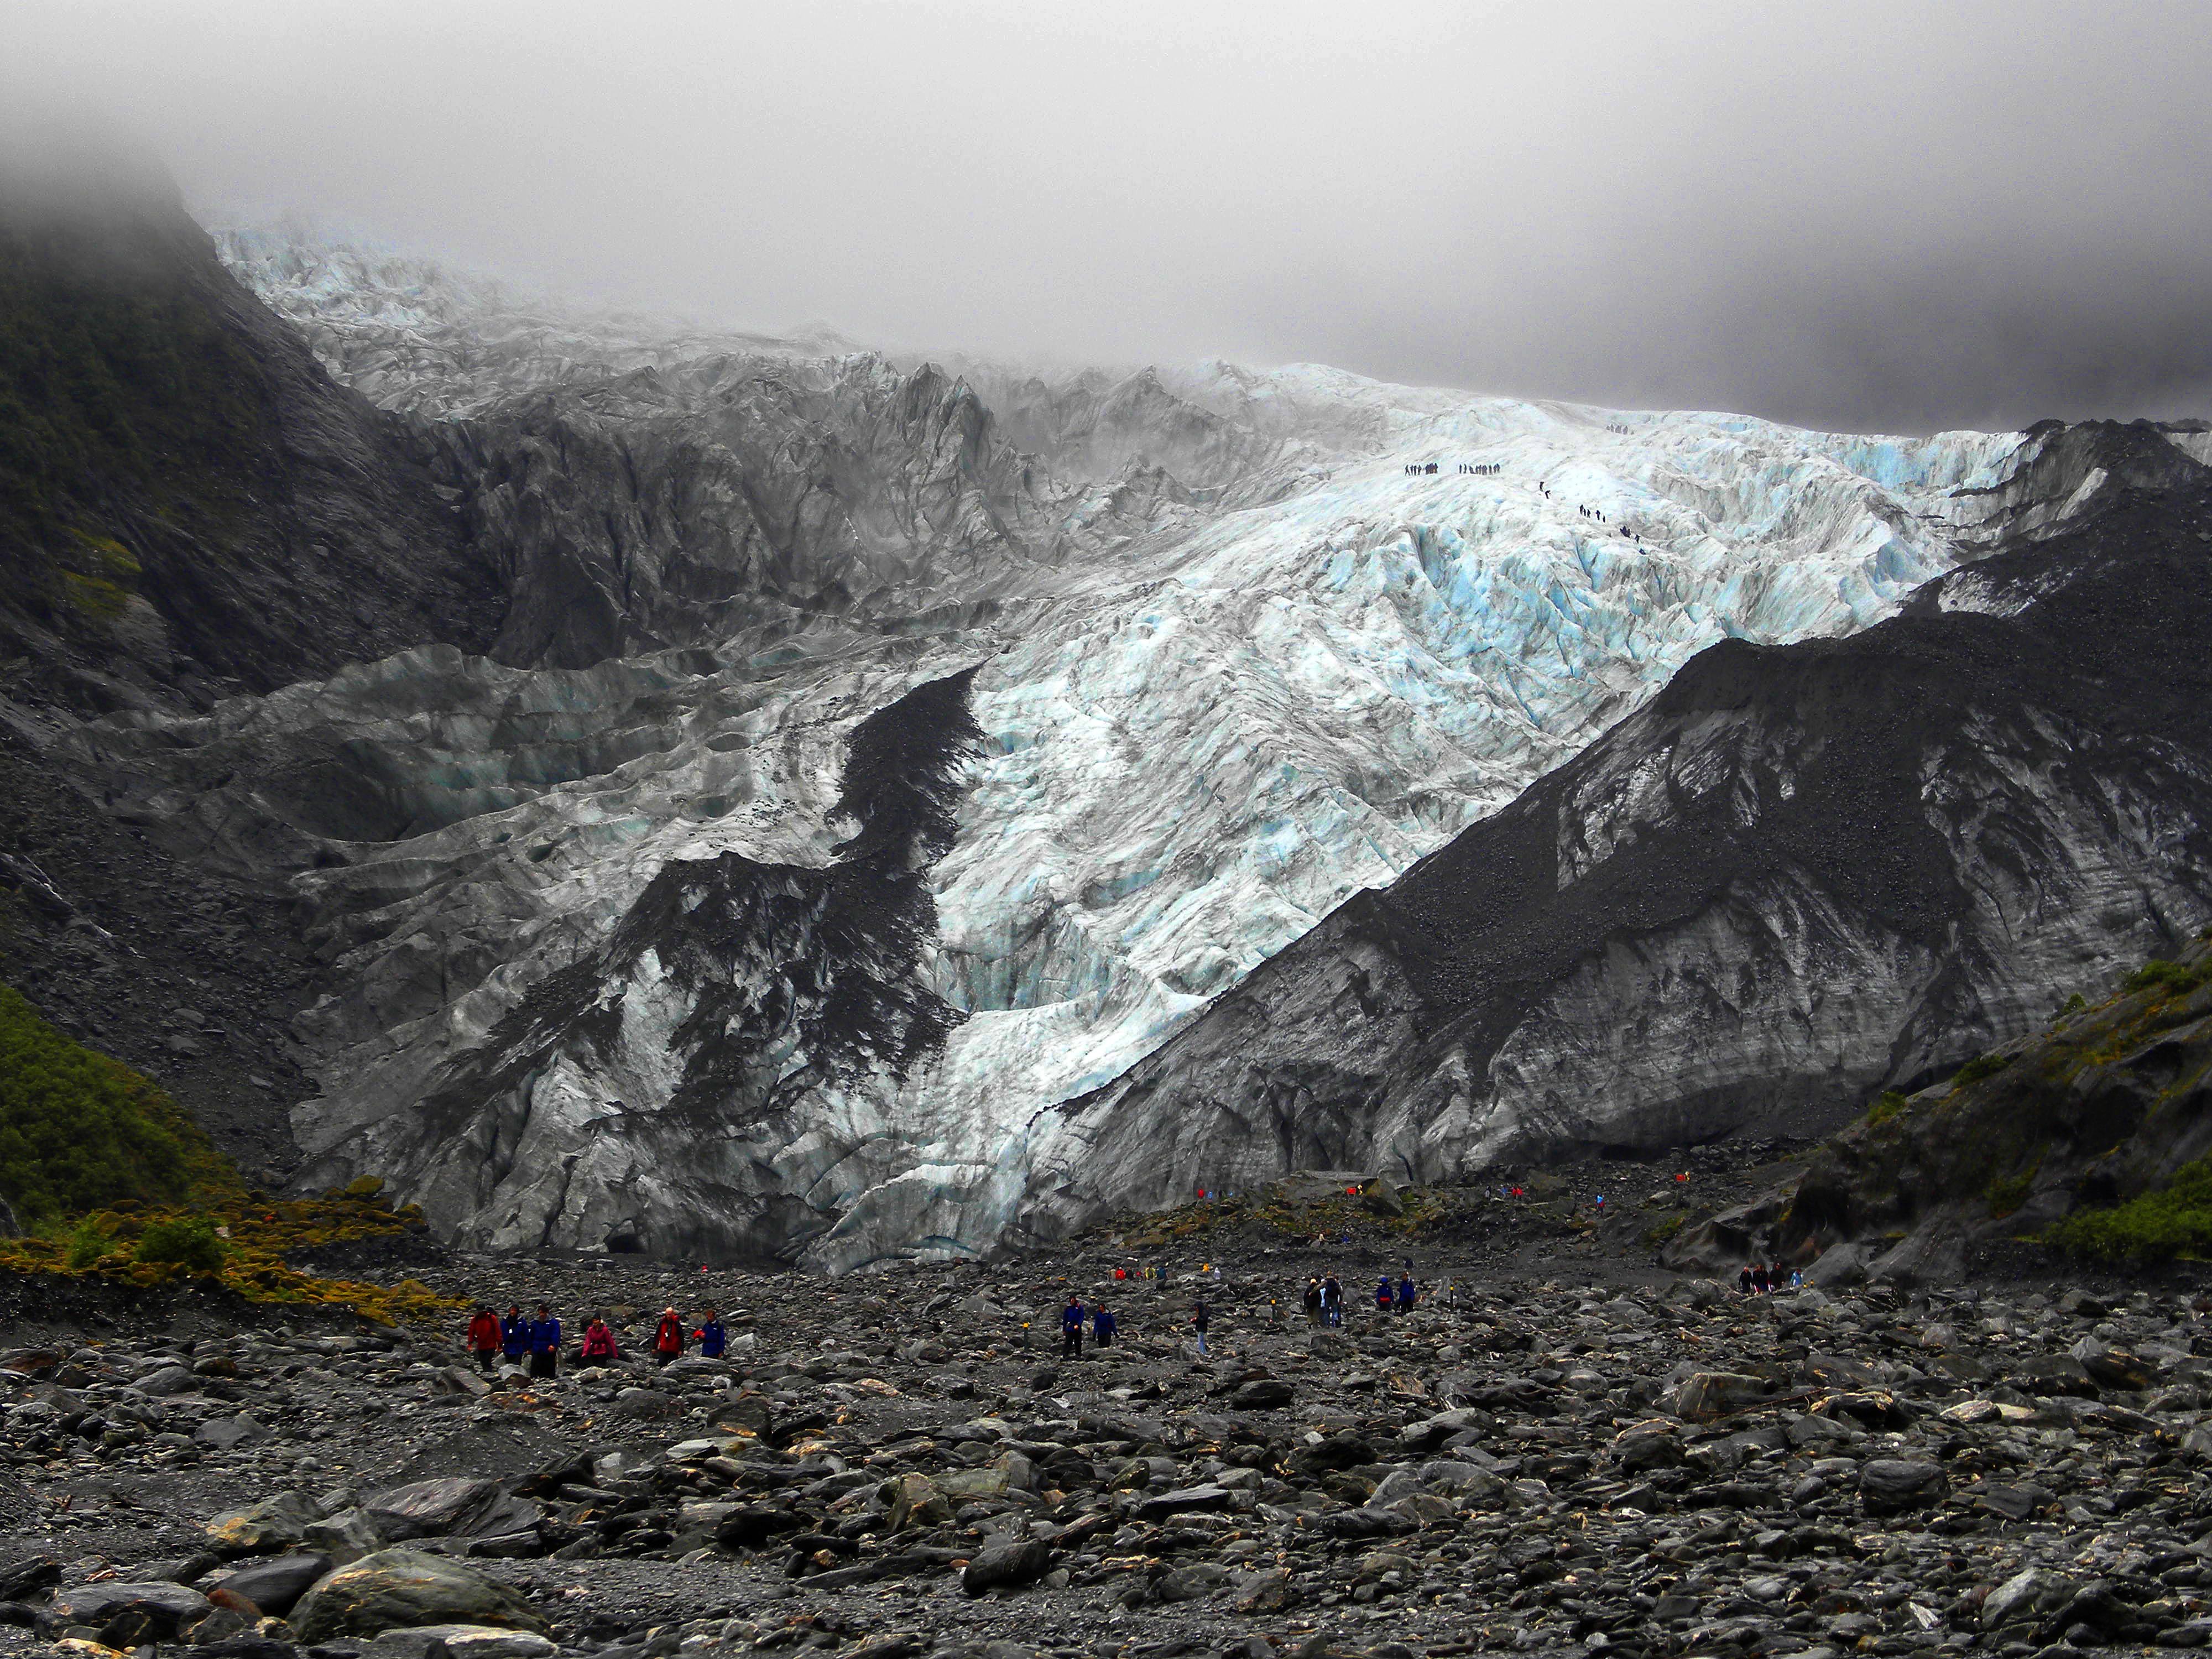 Grey Blue Glacier Mountain, Royalty free, Mountainside, Sky, Snow, HQ Photo